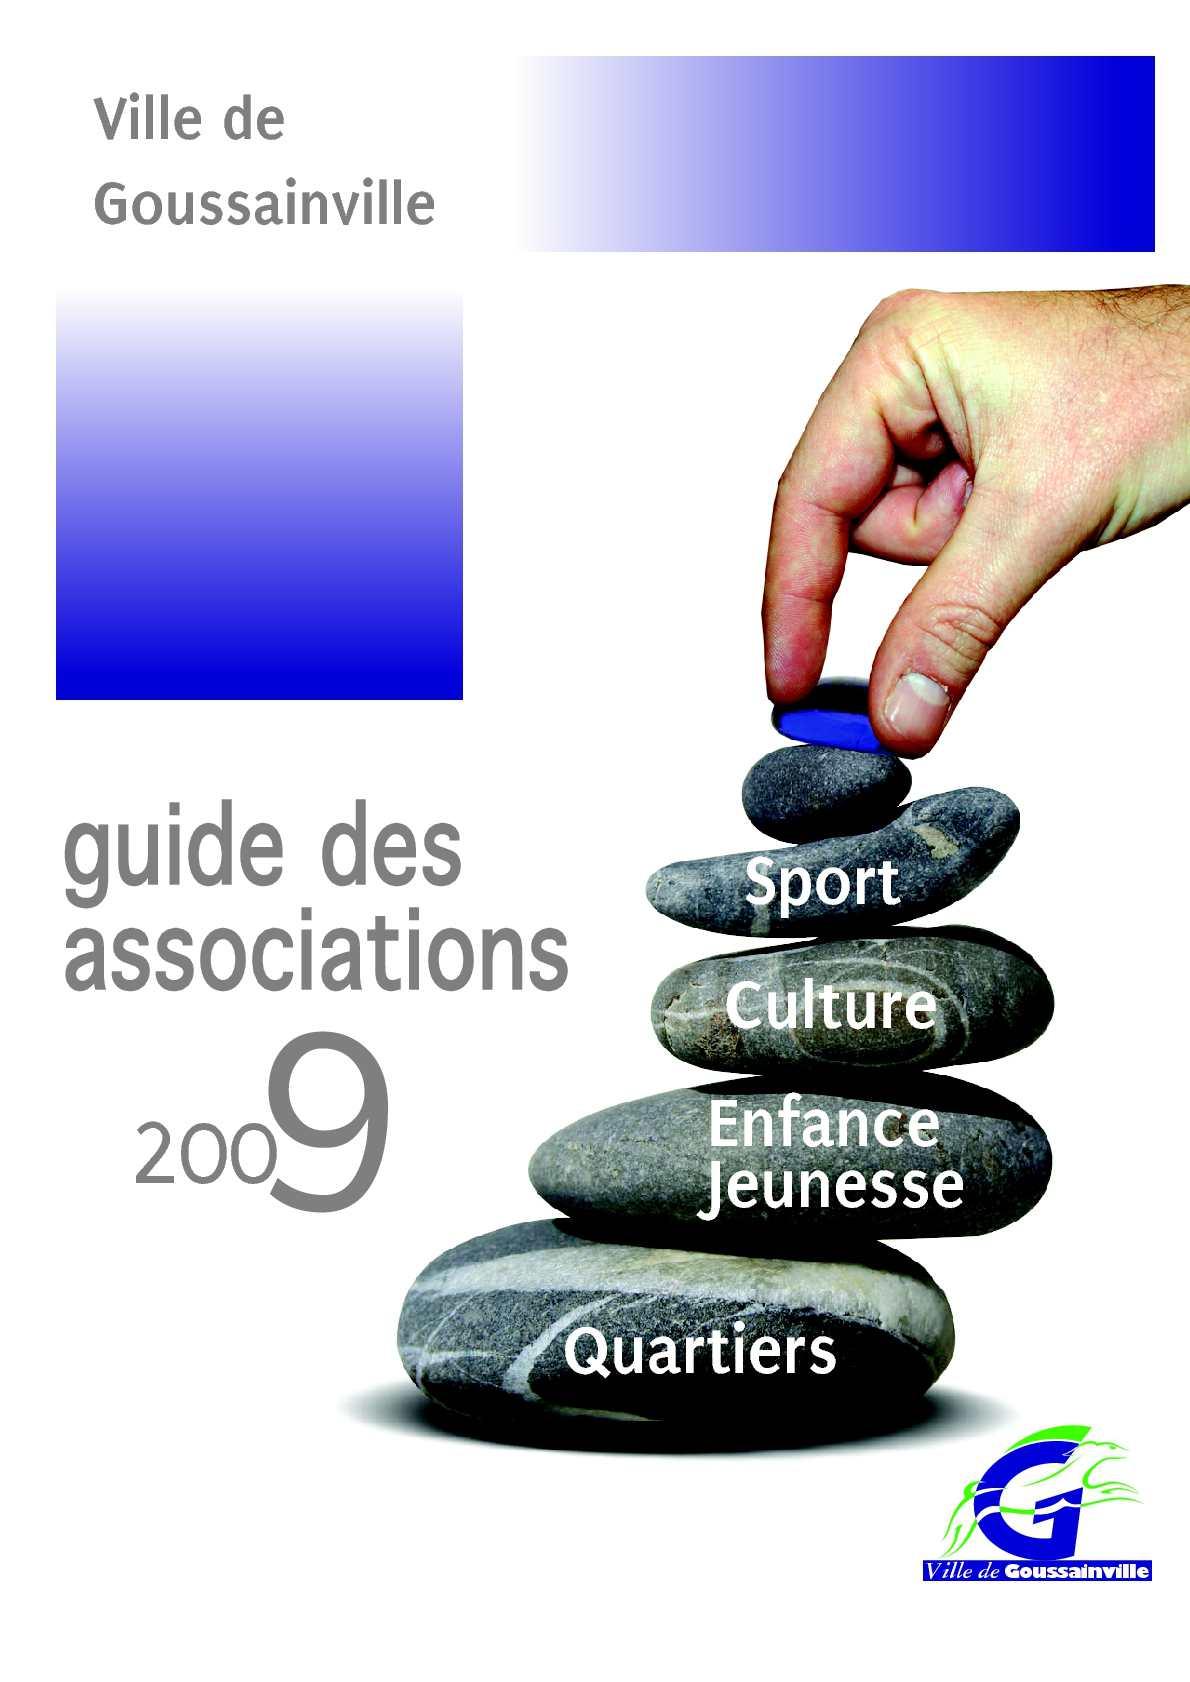 Calam o guide des associations 2009 ville de goussainville for Piscine de goussainville